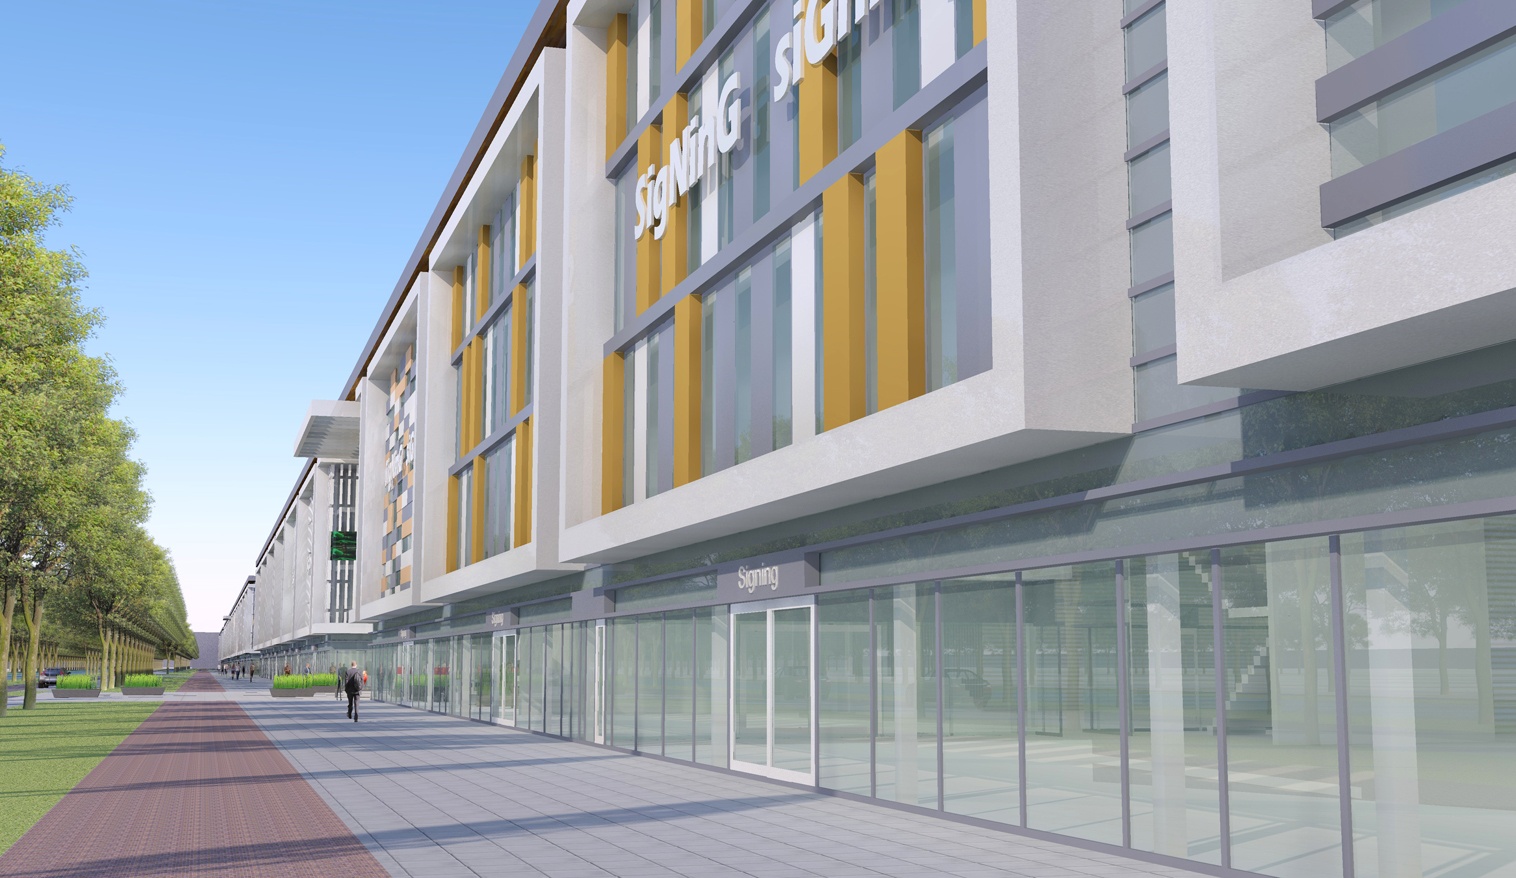 07 OPL Architecten_Schiphol Trade Boulevard-1516×878-72dpi